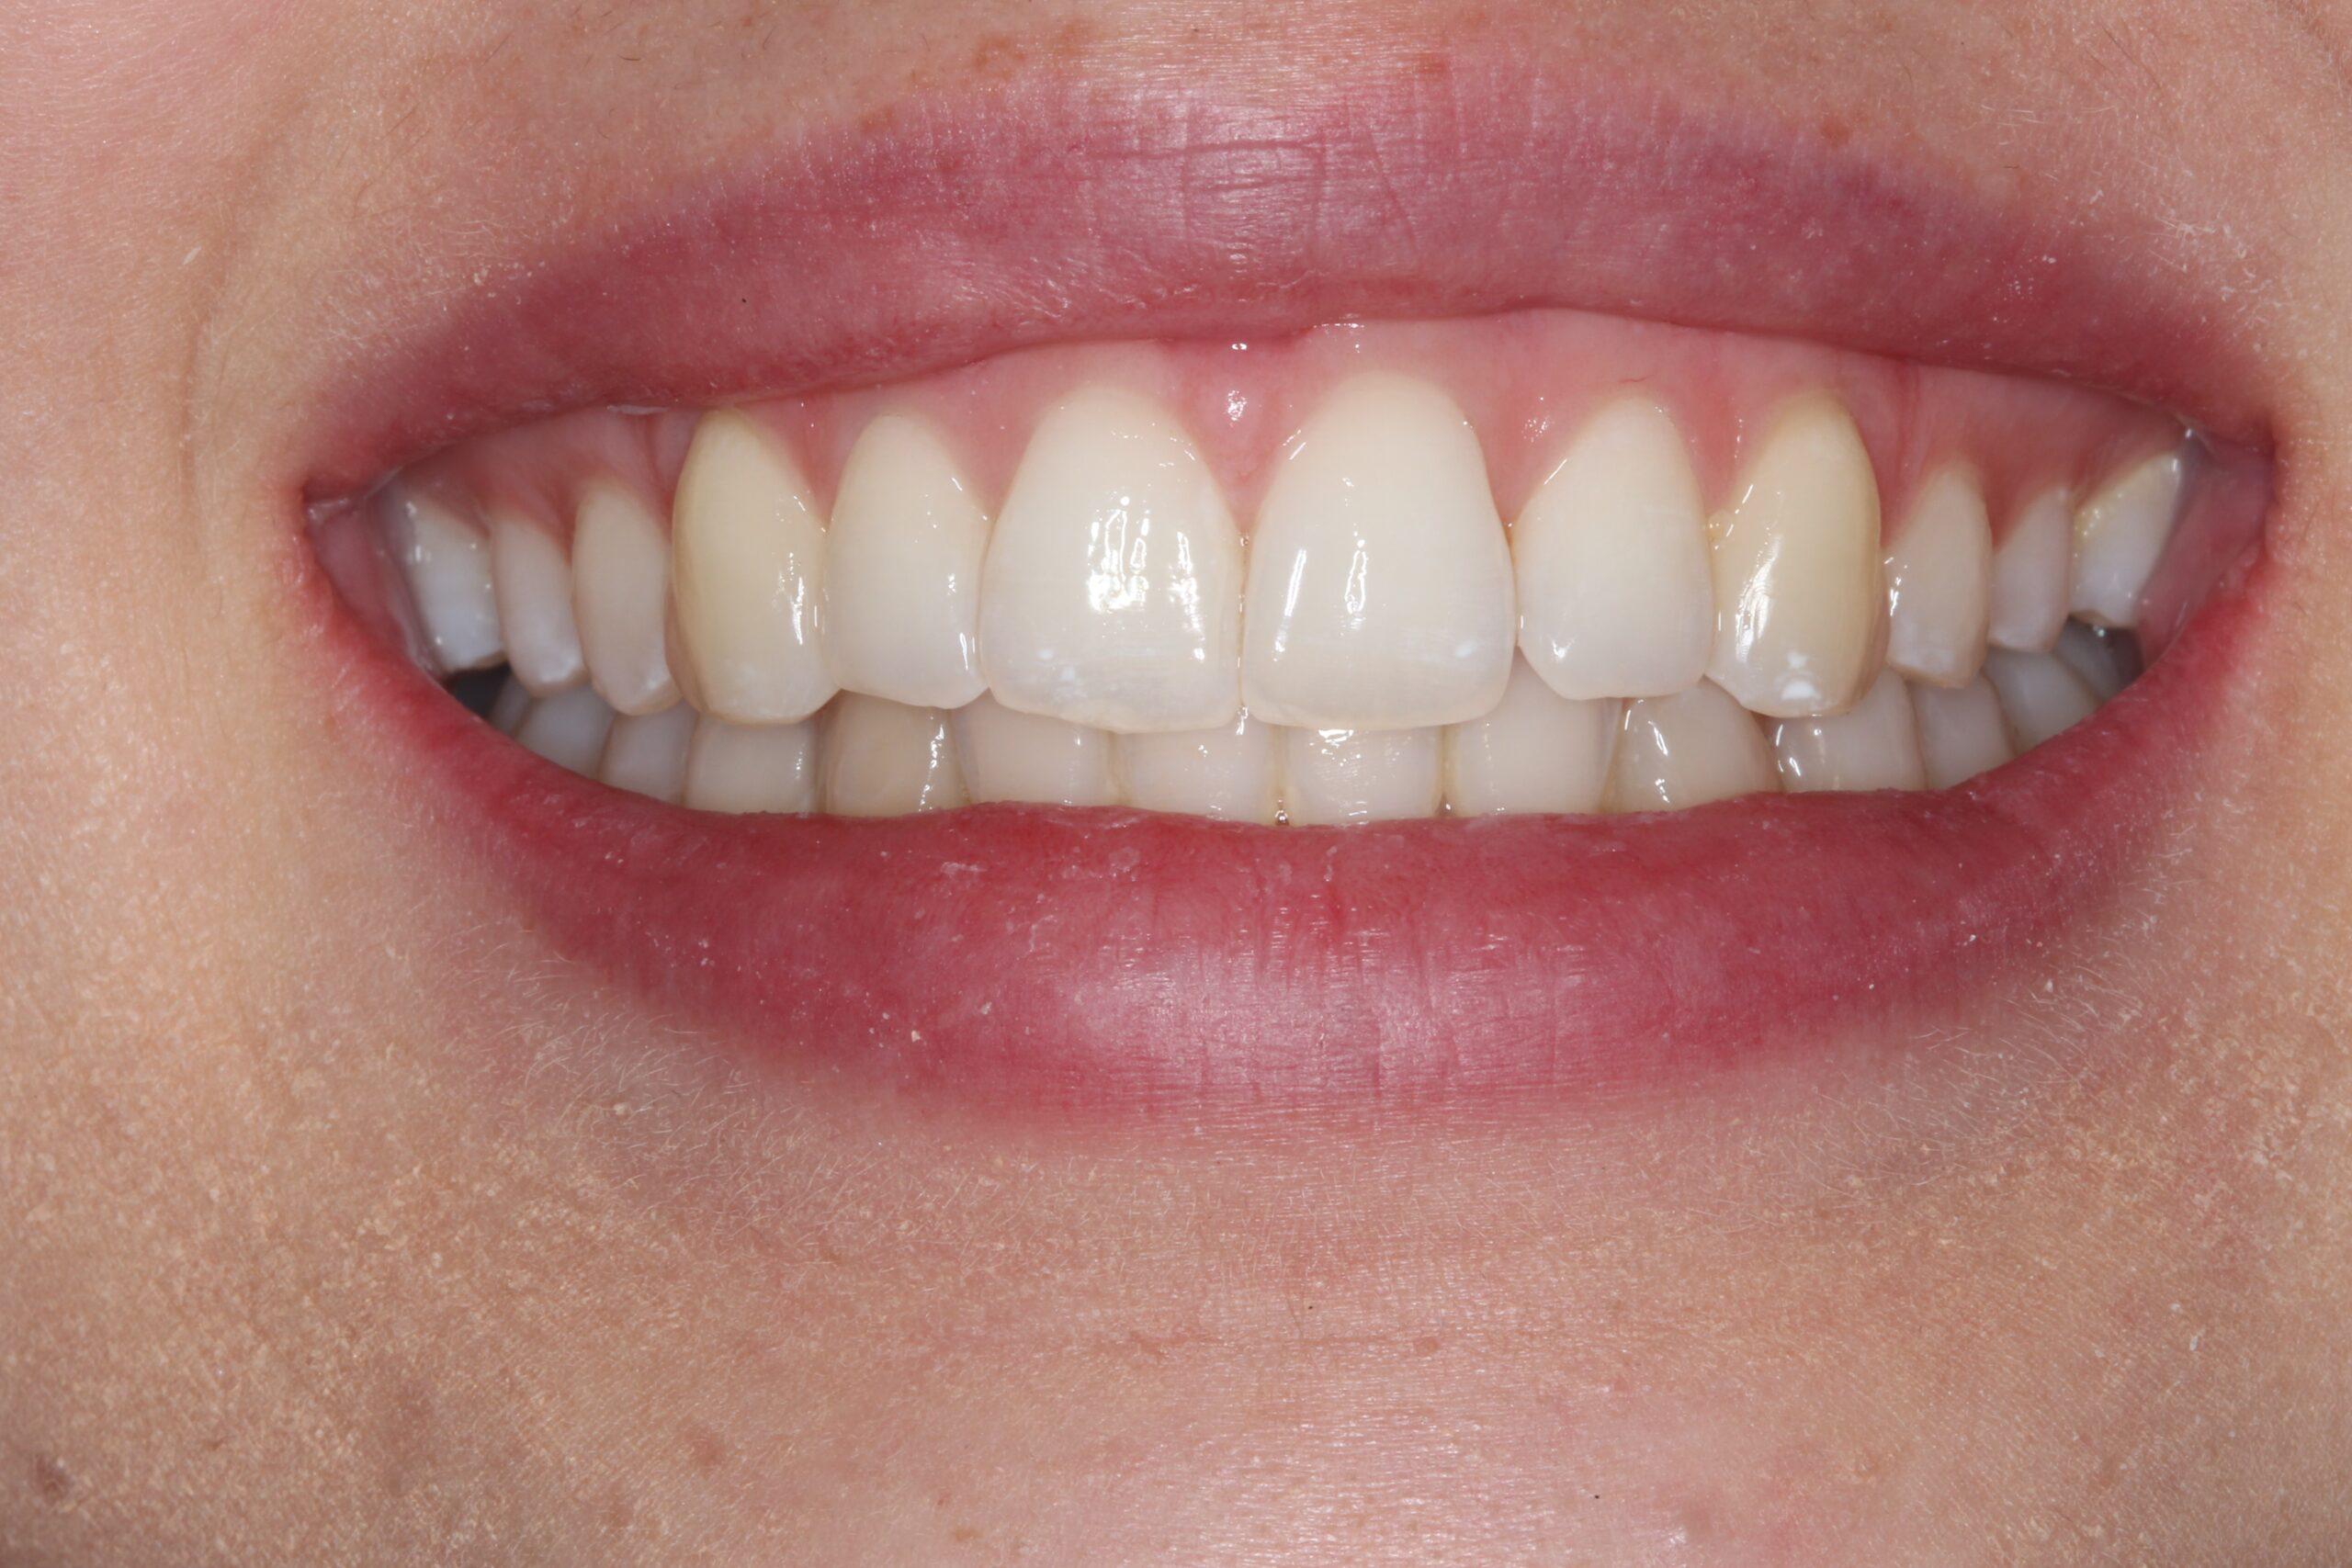 Case 6 (After) treating at Surbiton Dental